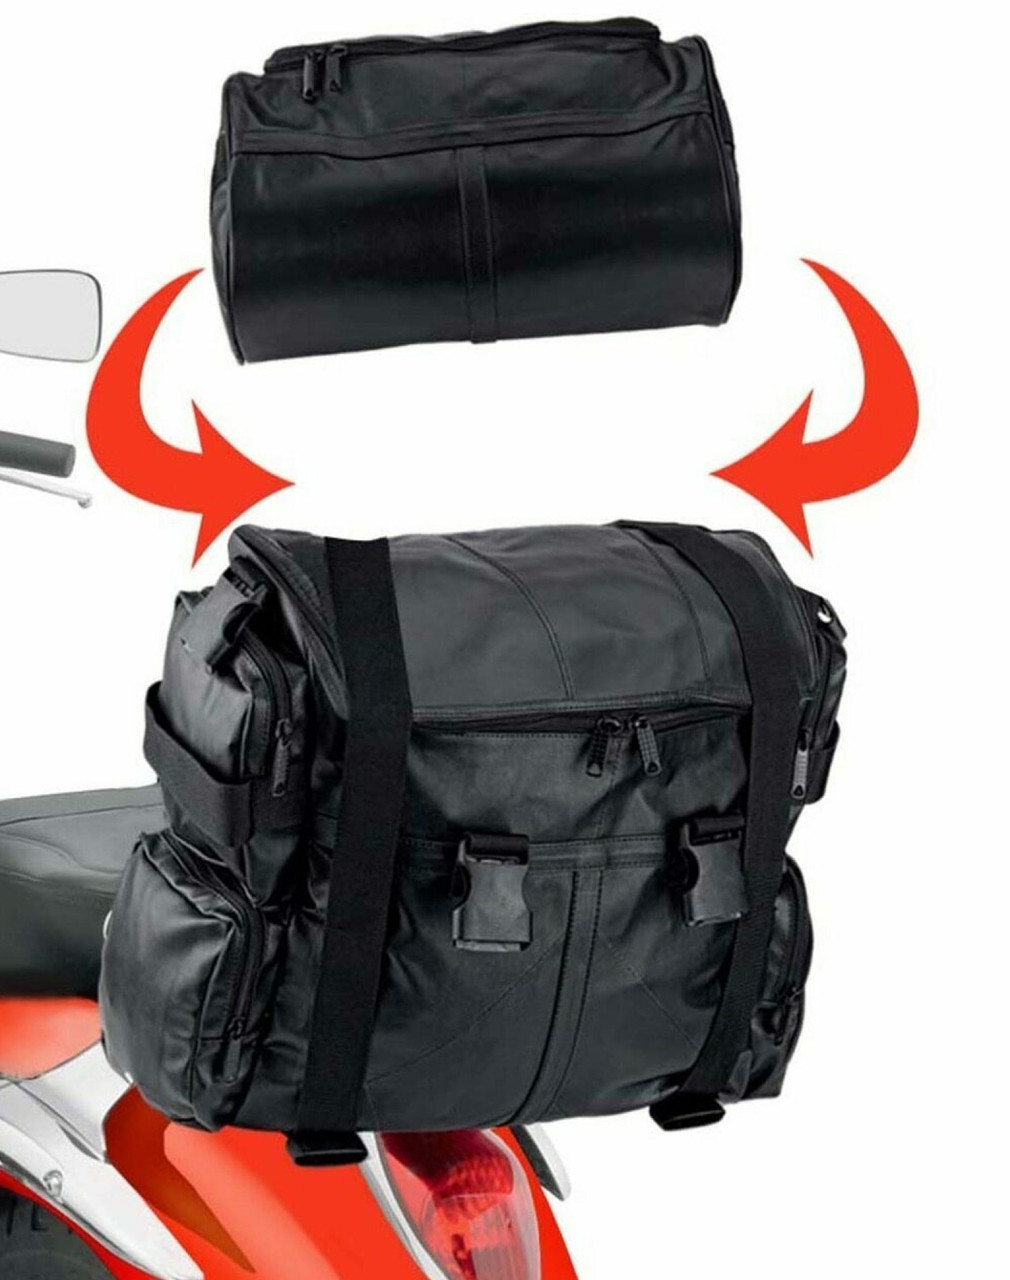 Viking Aero Medium Expandable Motorcycle Sissy Bar Bags with roll bag